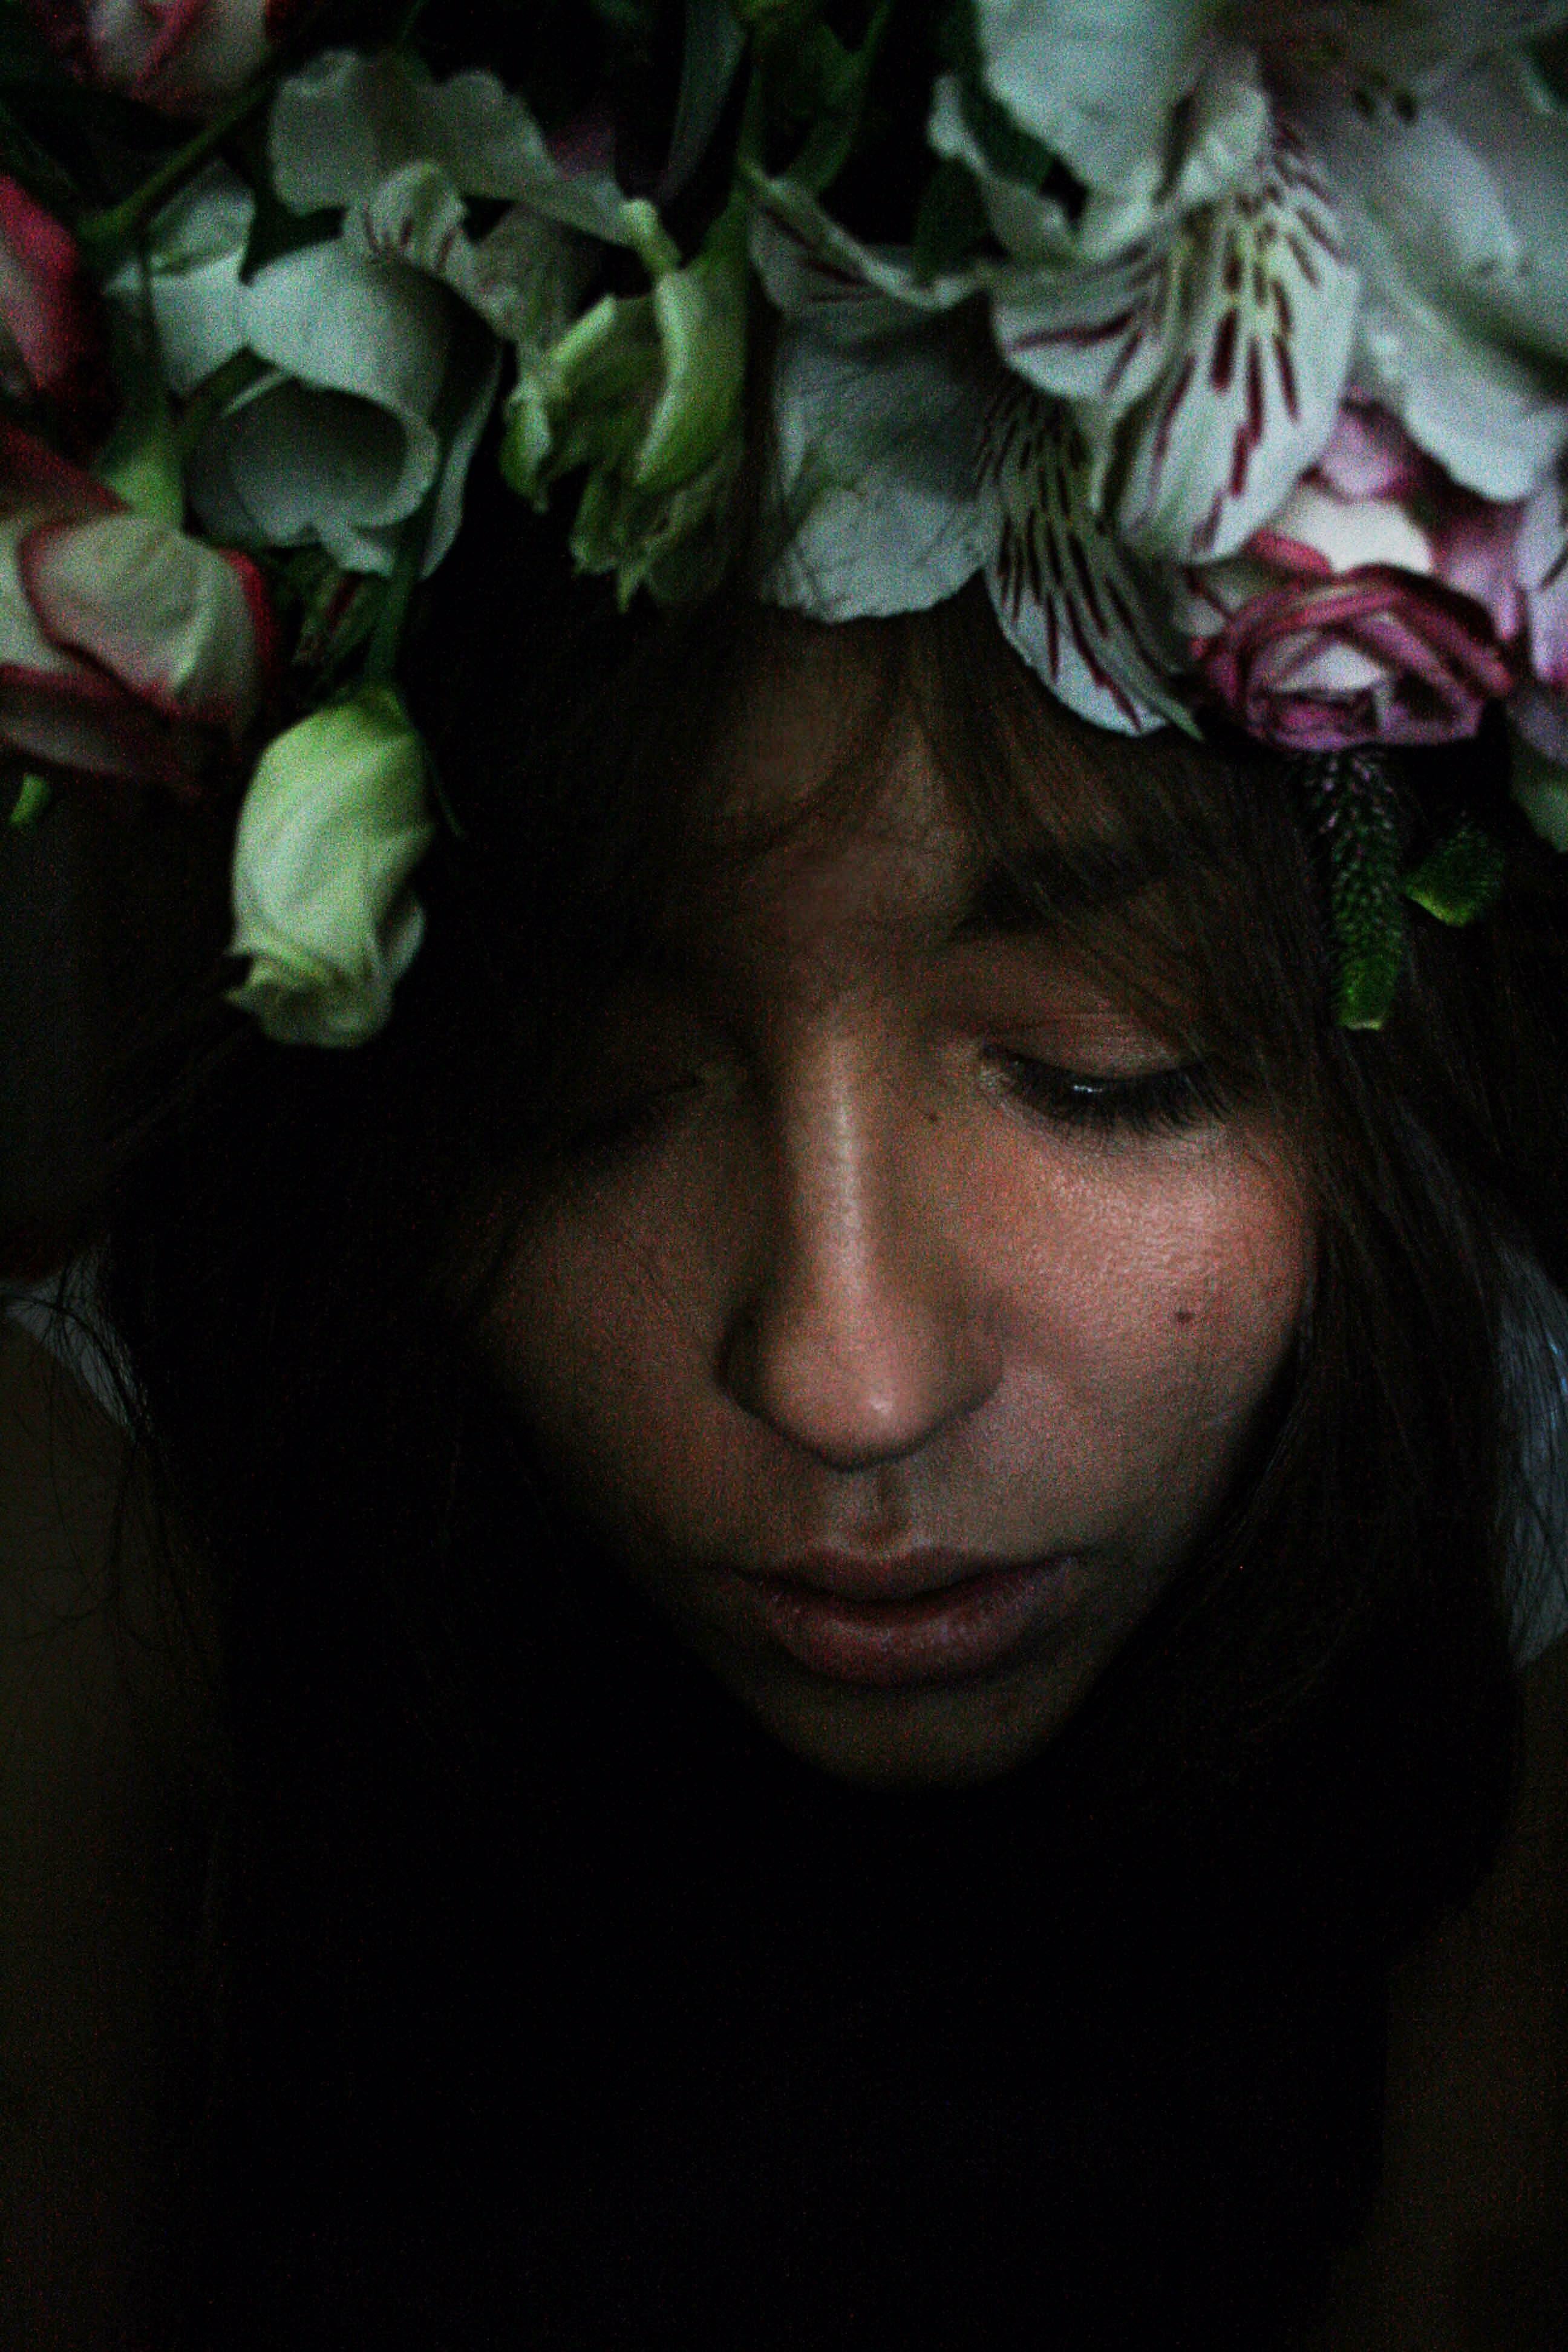 woman with flower headband